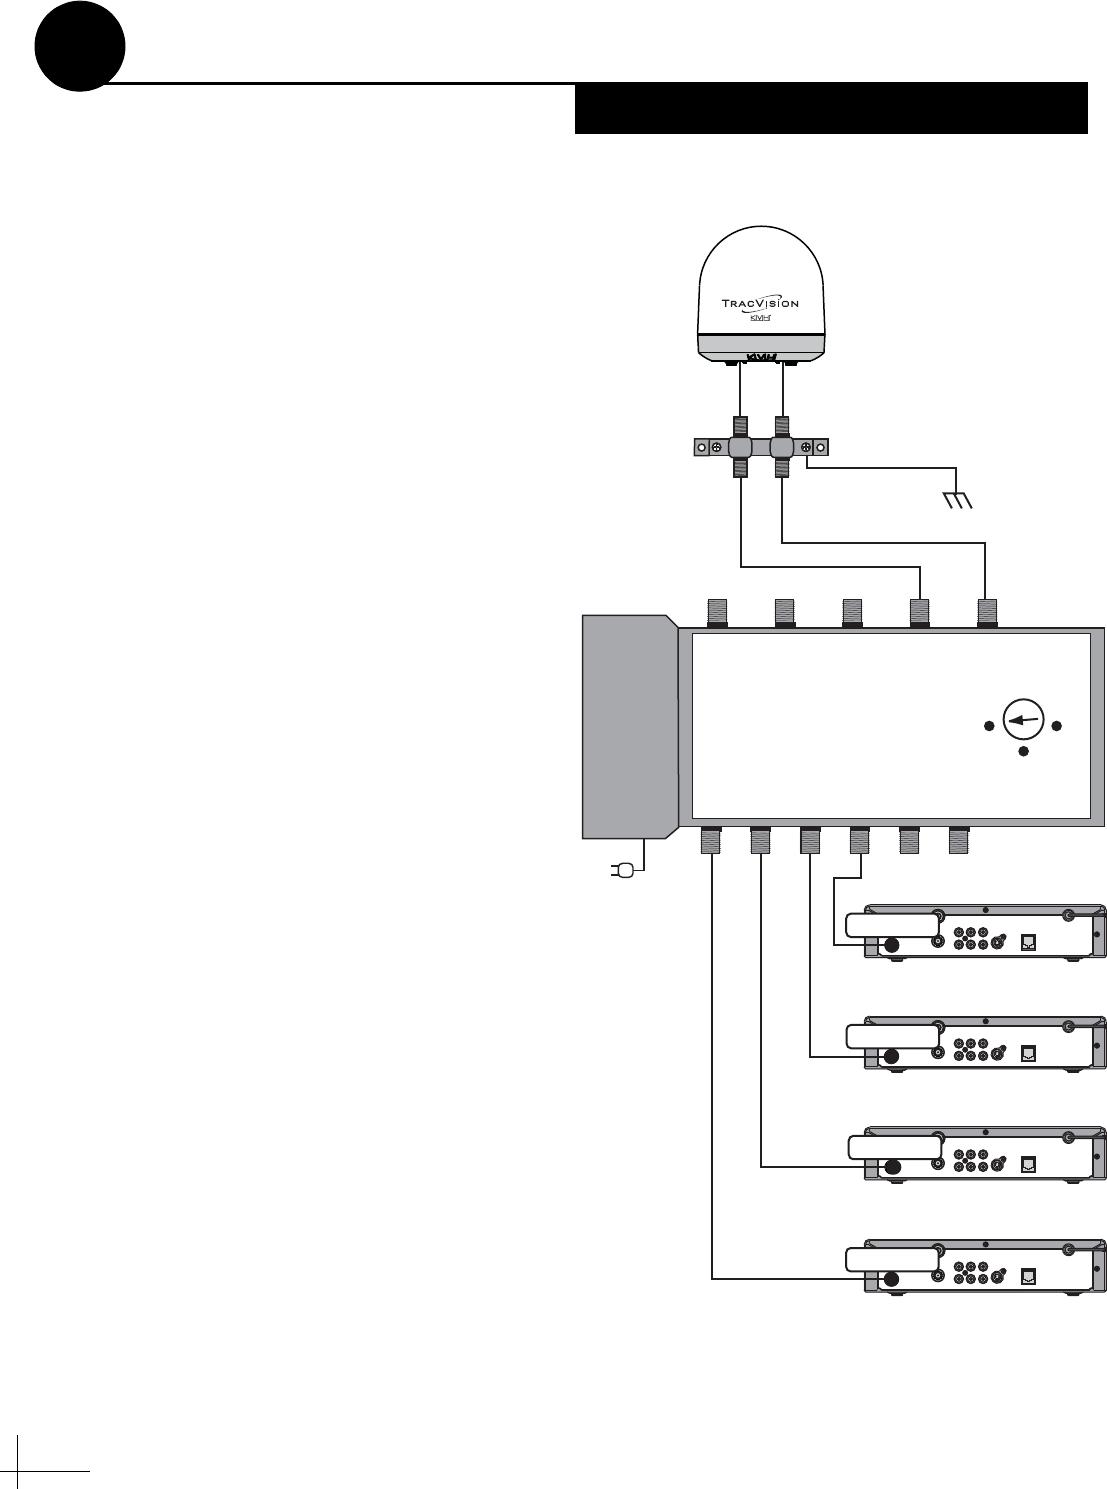 Handleiding Kvh Tracvision M7 Pagina 30 Van 38 English Rj22 Wiring Diagram